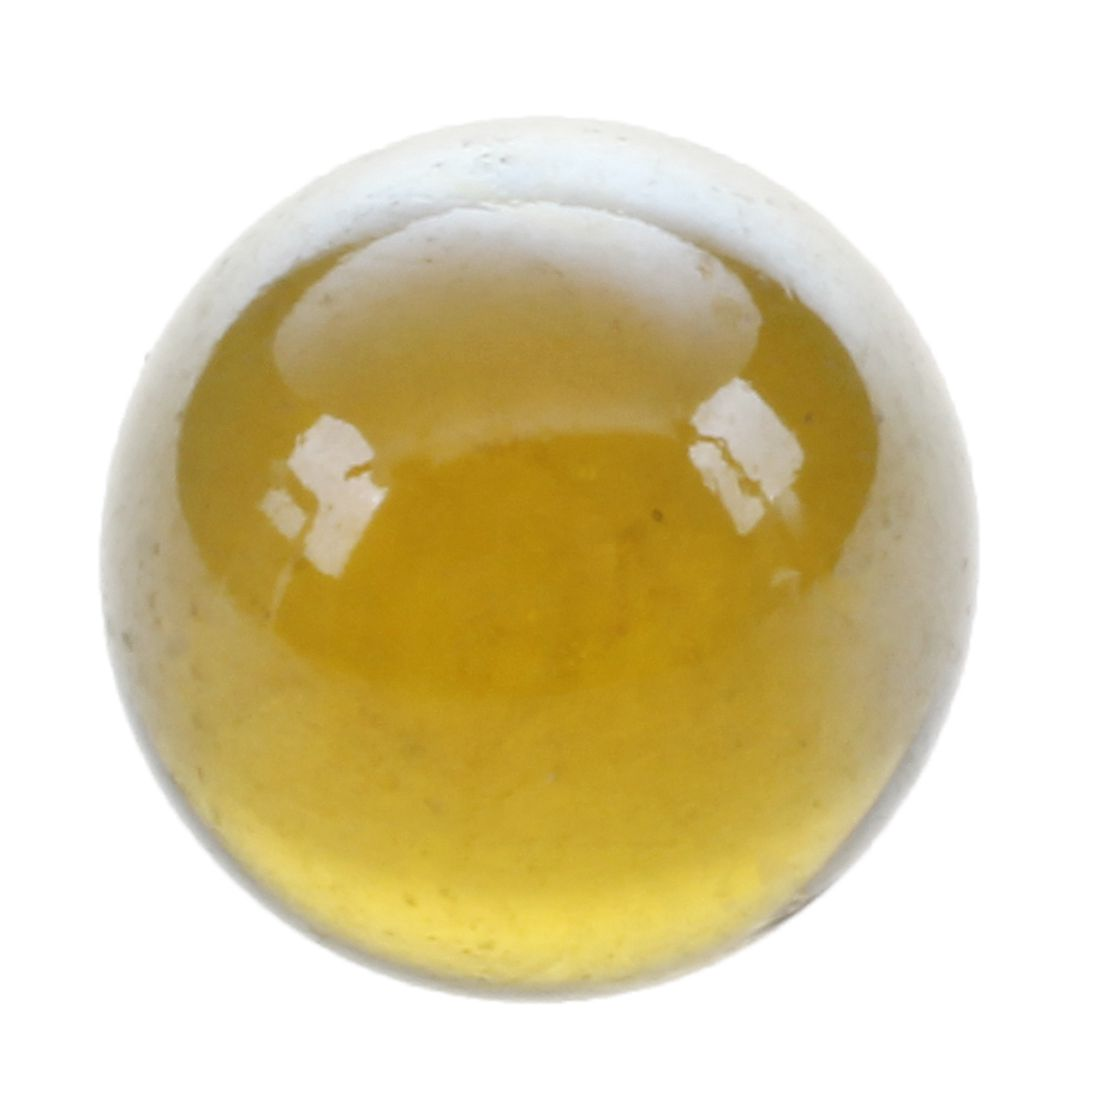 New 10 Pcs Marbles 16mm glass marbles Knicker glass balls decoration toy Dark Brown